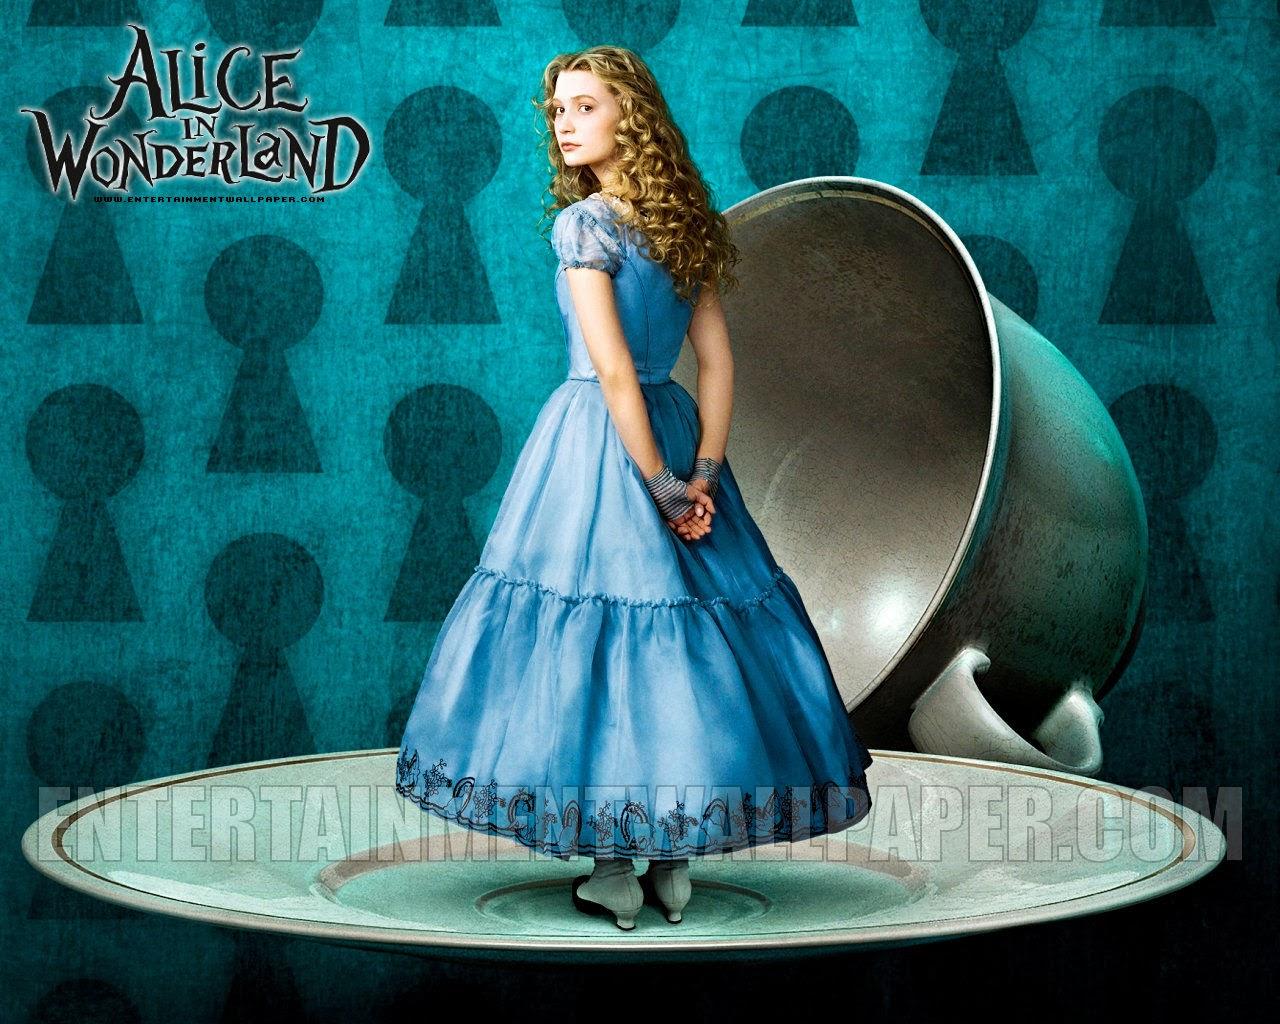 free hd wallpaper download alice in wonderland wallpaper